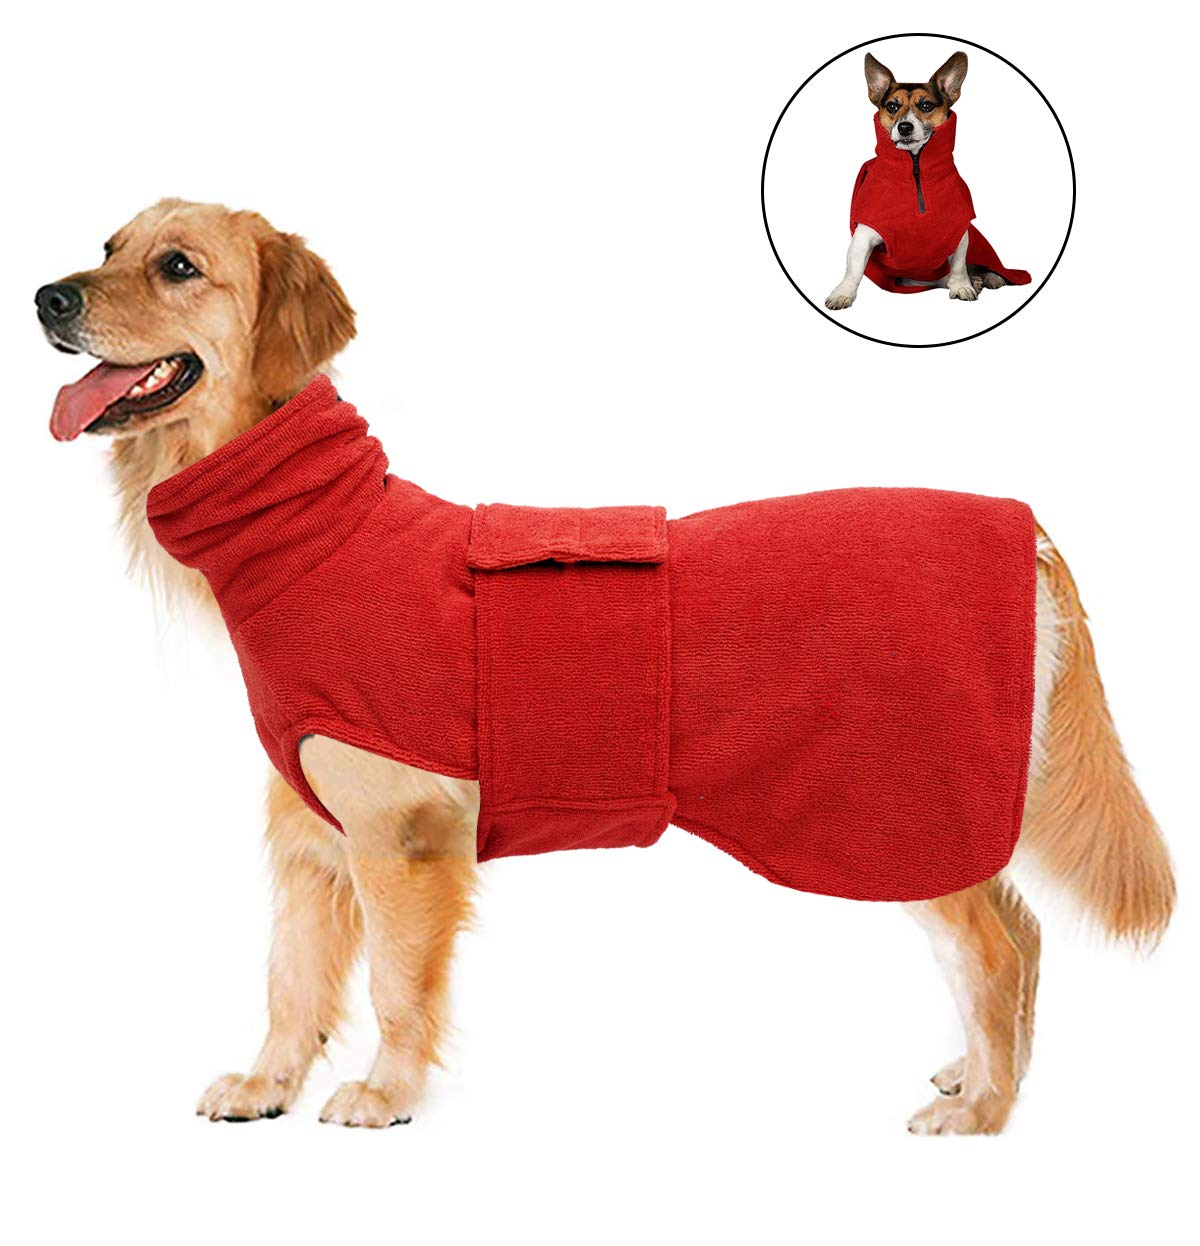 Geyecete Dog Bathrobe Soft Super Absorbent Luxuriously Microfiber Dog Drying Towel Robe,Pet Dog Cat Bath Robe Towel